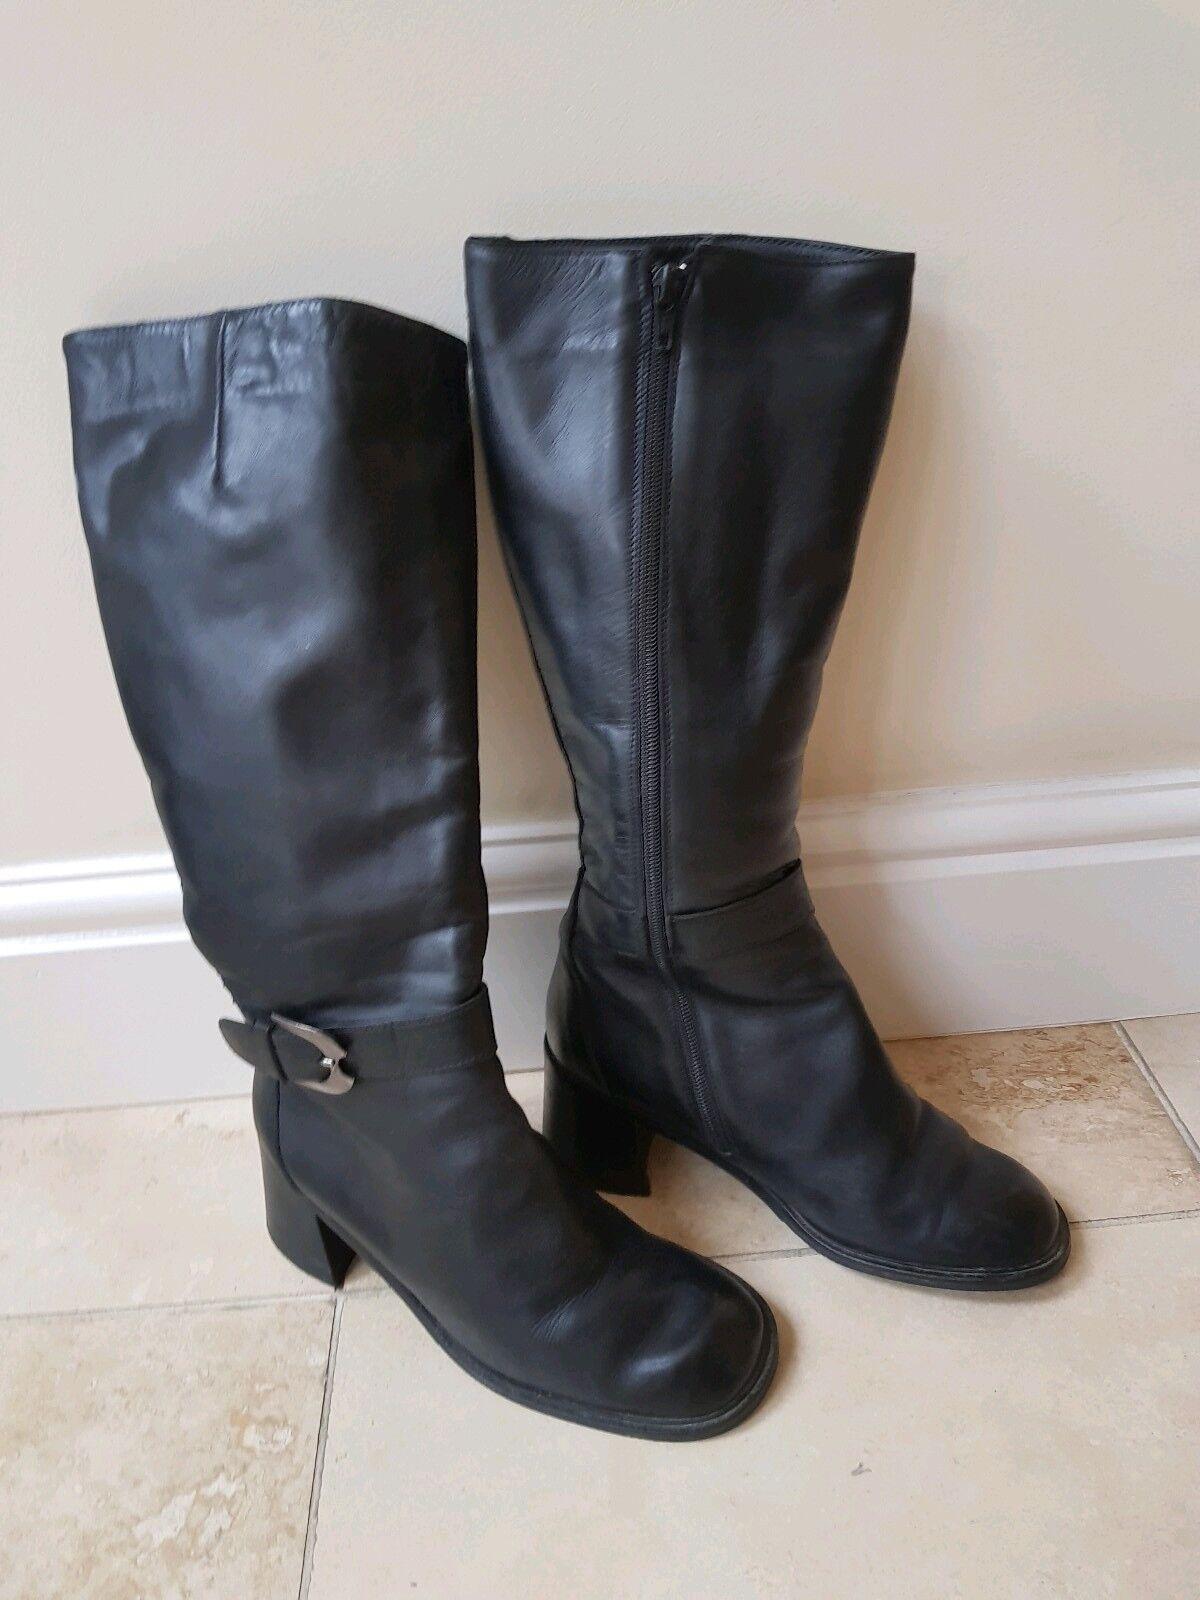 Angela Falconi Italian Black Leather Shearling Sheep Knee High Boots UK 4.5 37.5